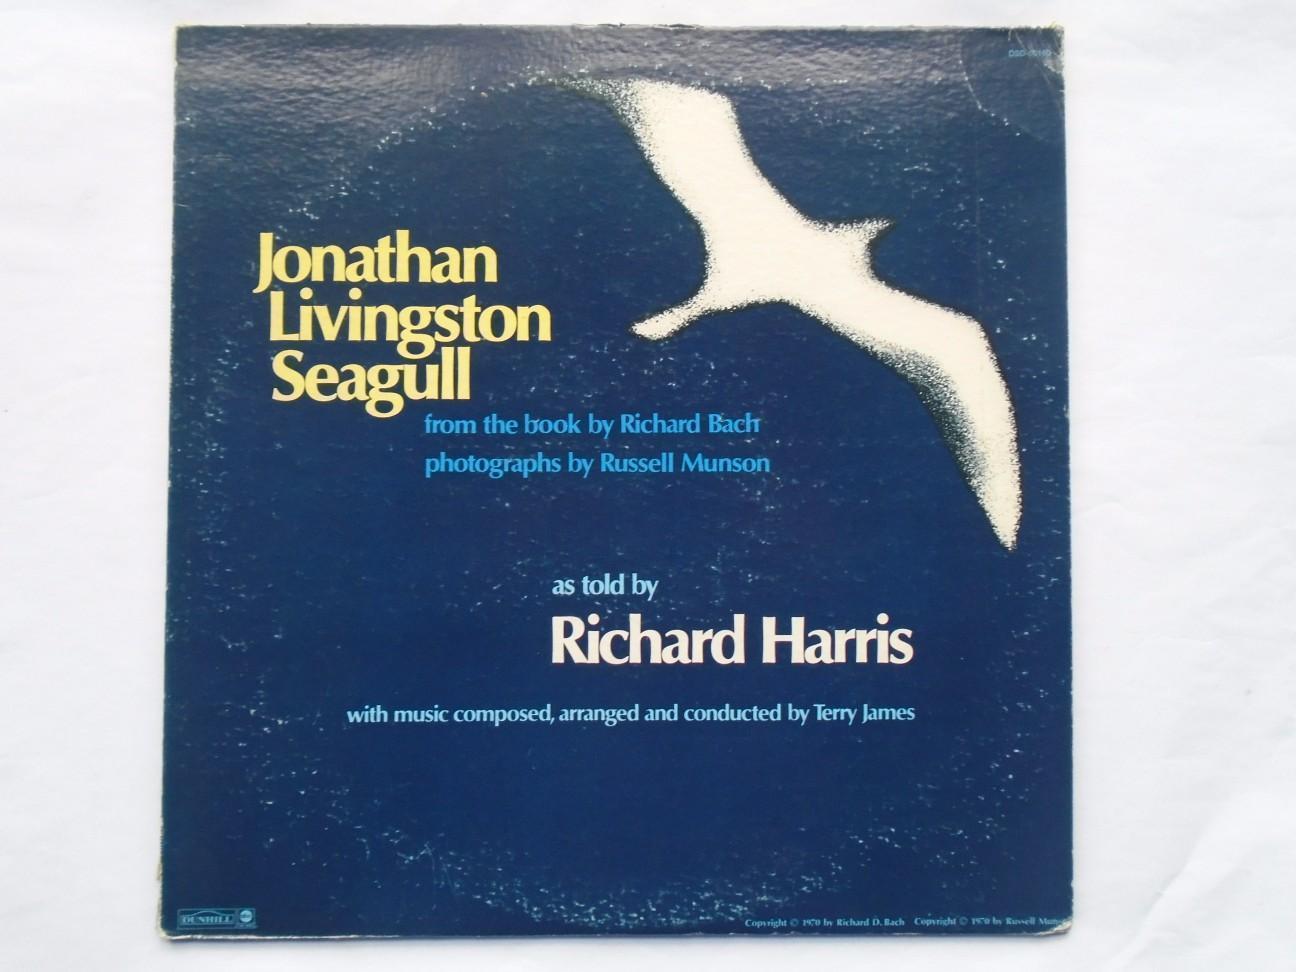 Richard Harris - Jonathan Livingston Seagull Record